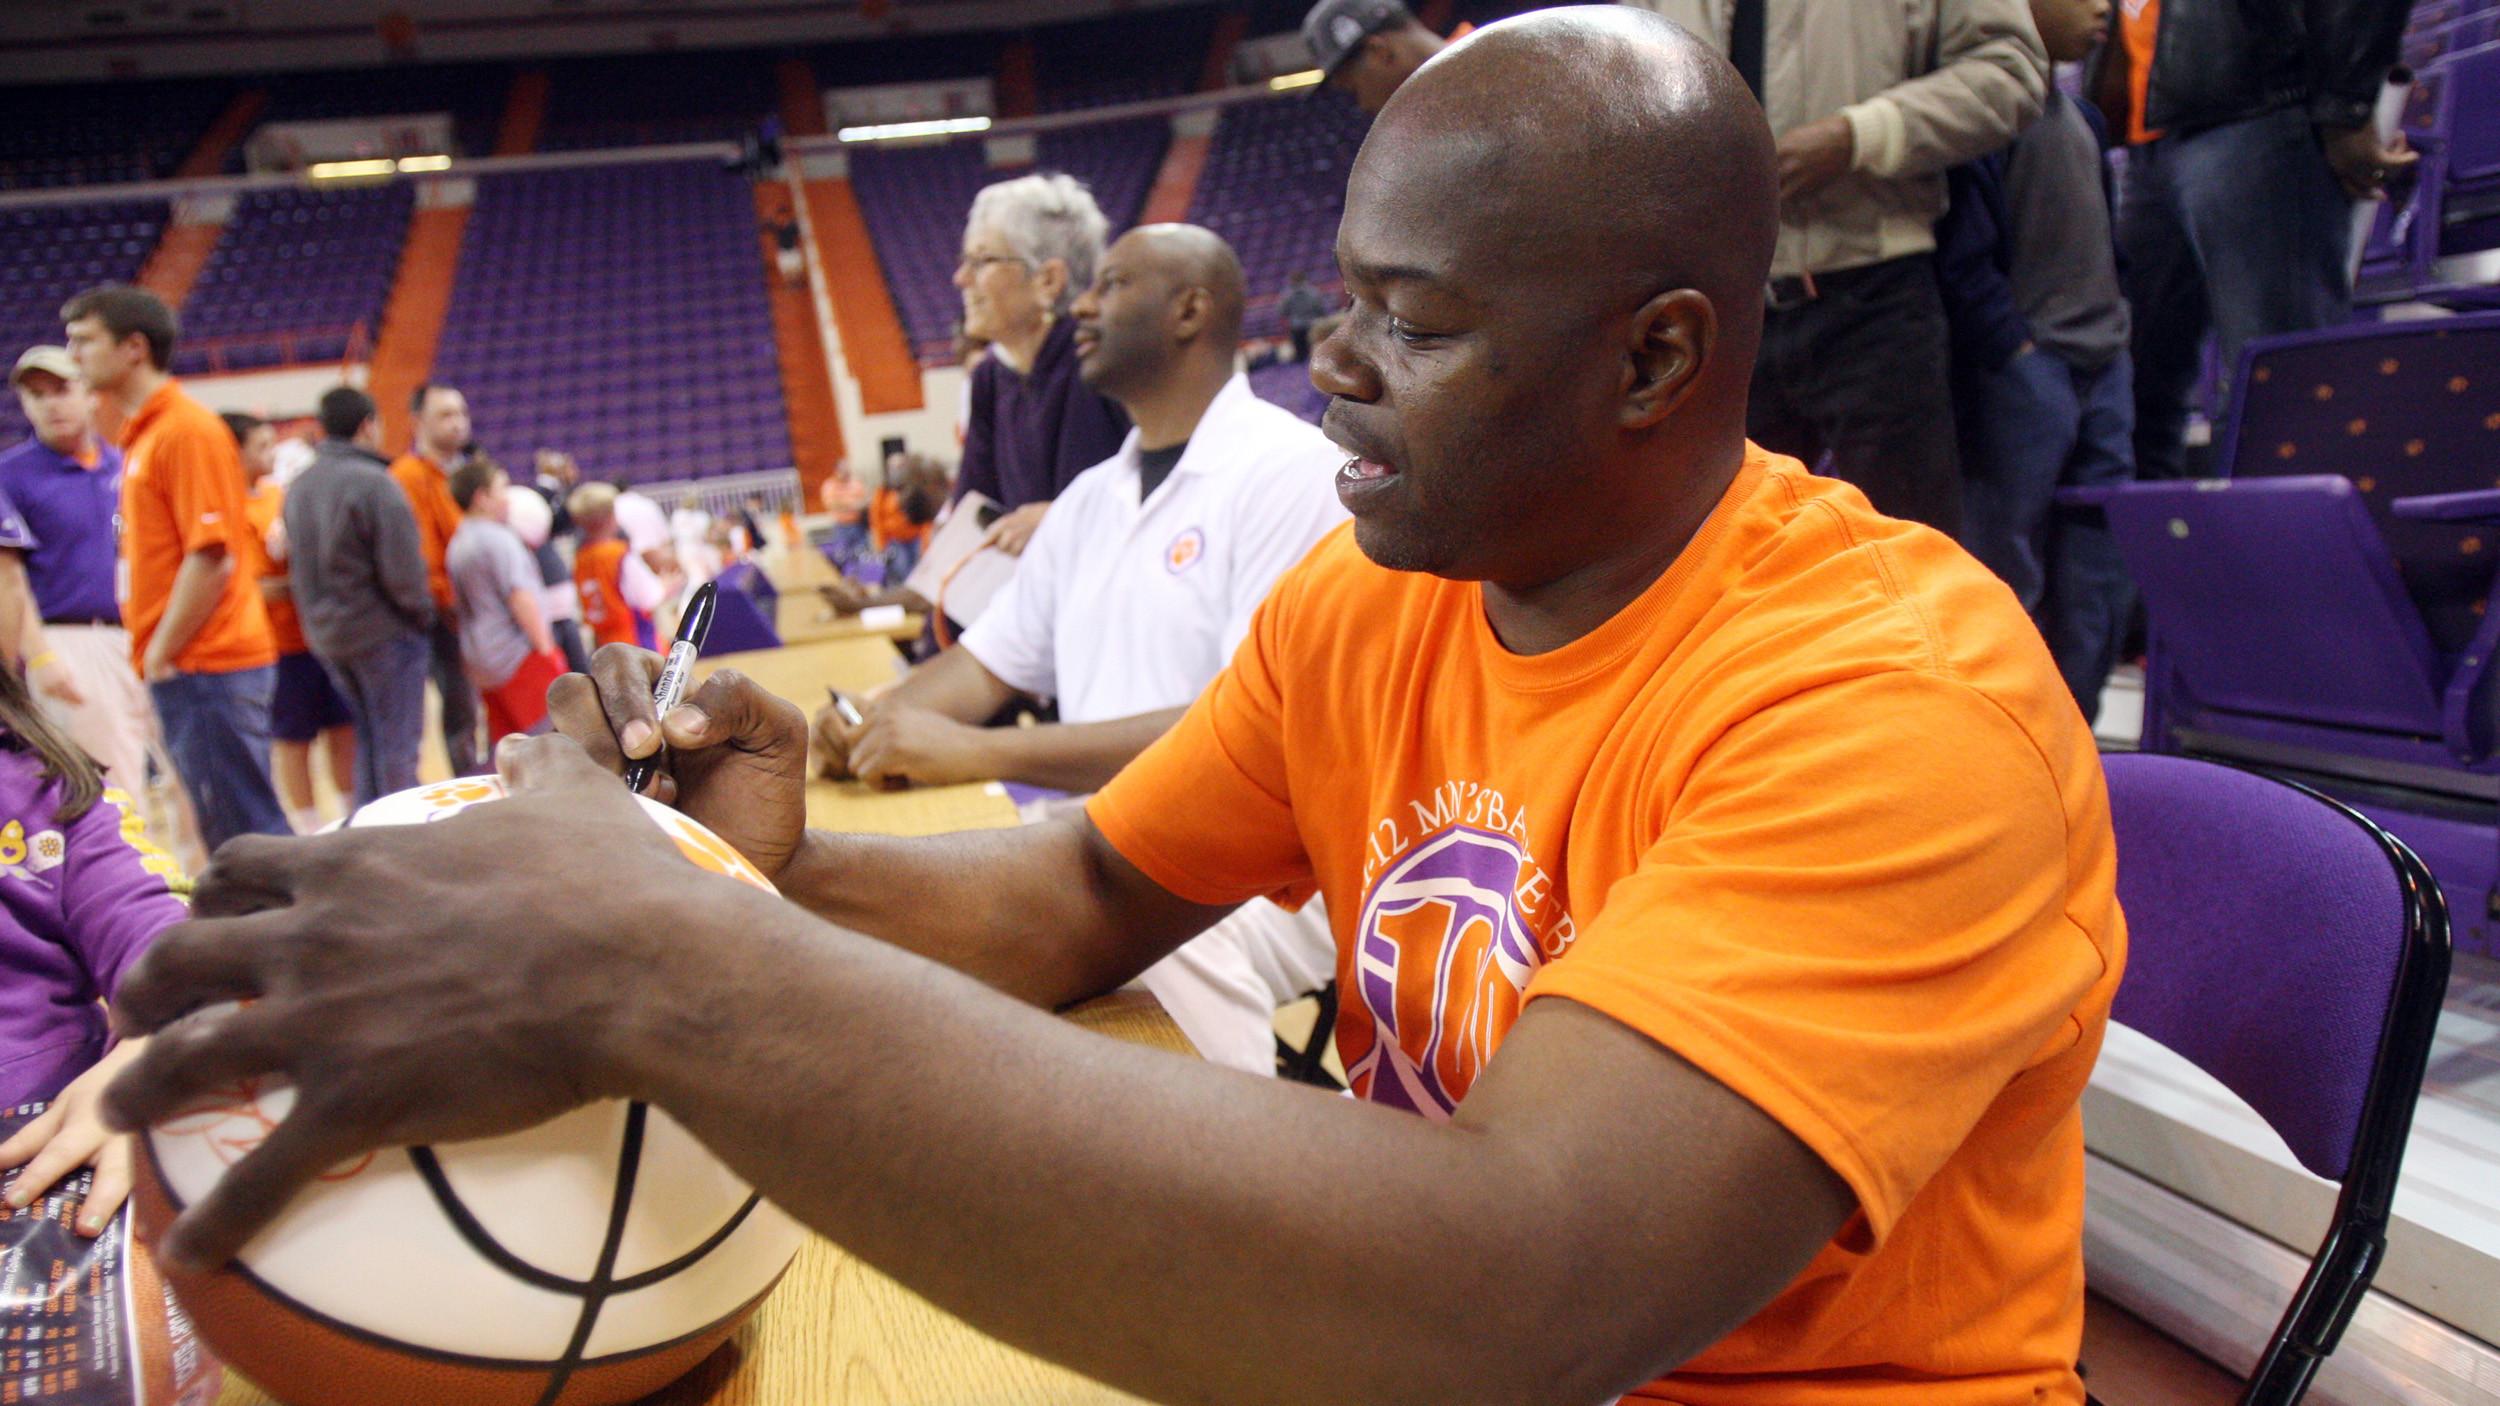 Men's Basketball Alumni Reunion Information